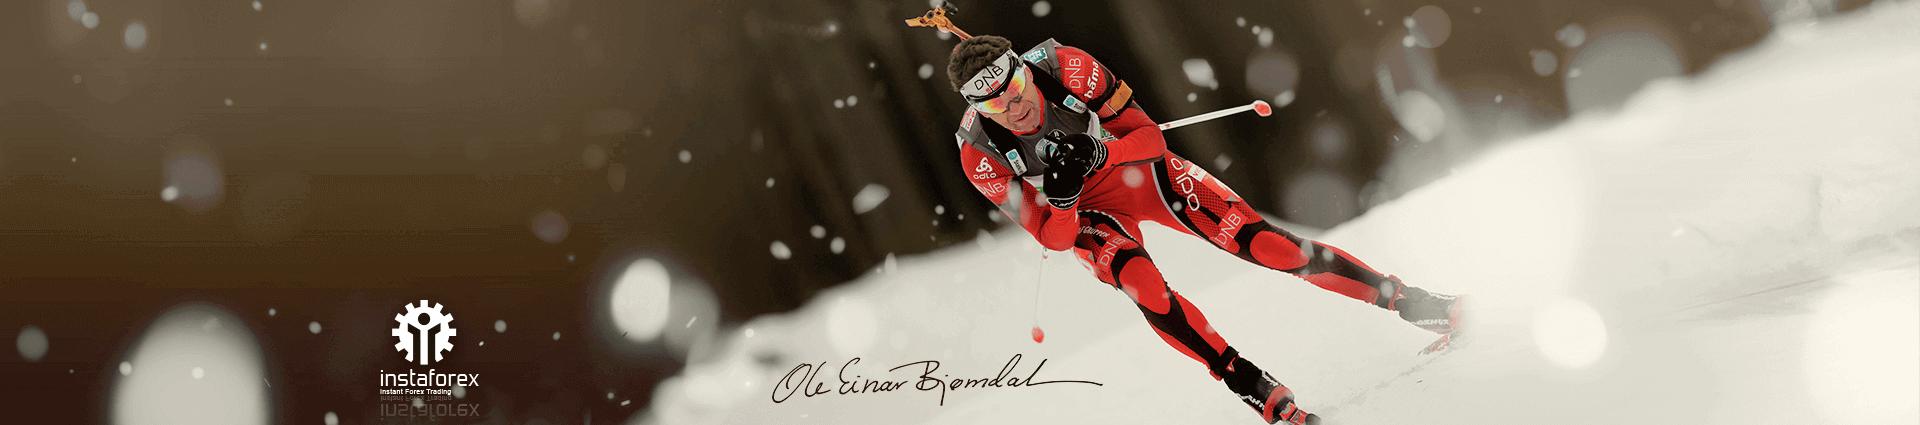 Ole Einar Bjorndalen - de merkambassadeur van InstaForex